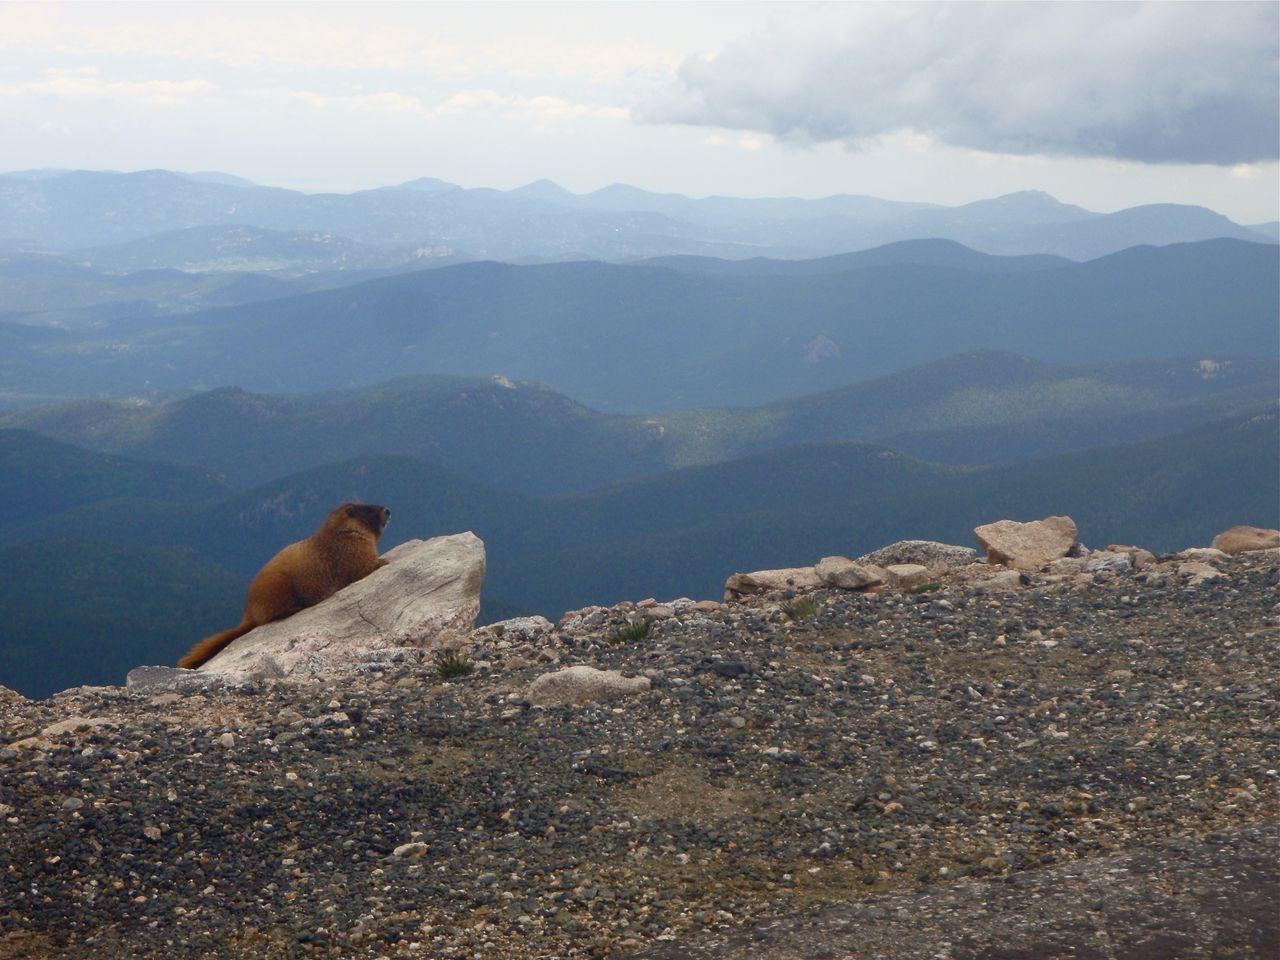 Marmot On Rock Over Mountain Against Sky